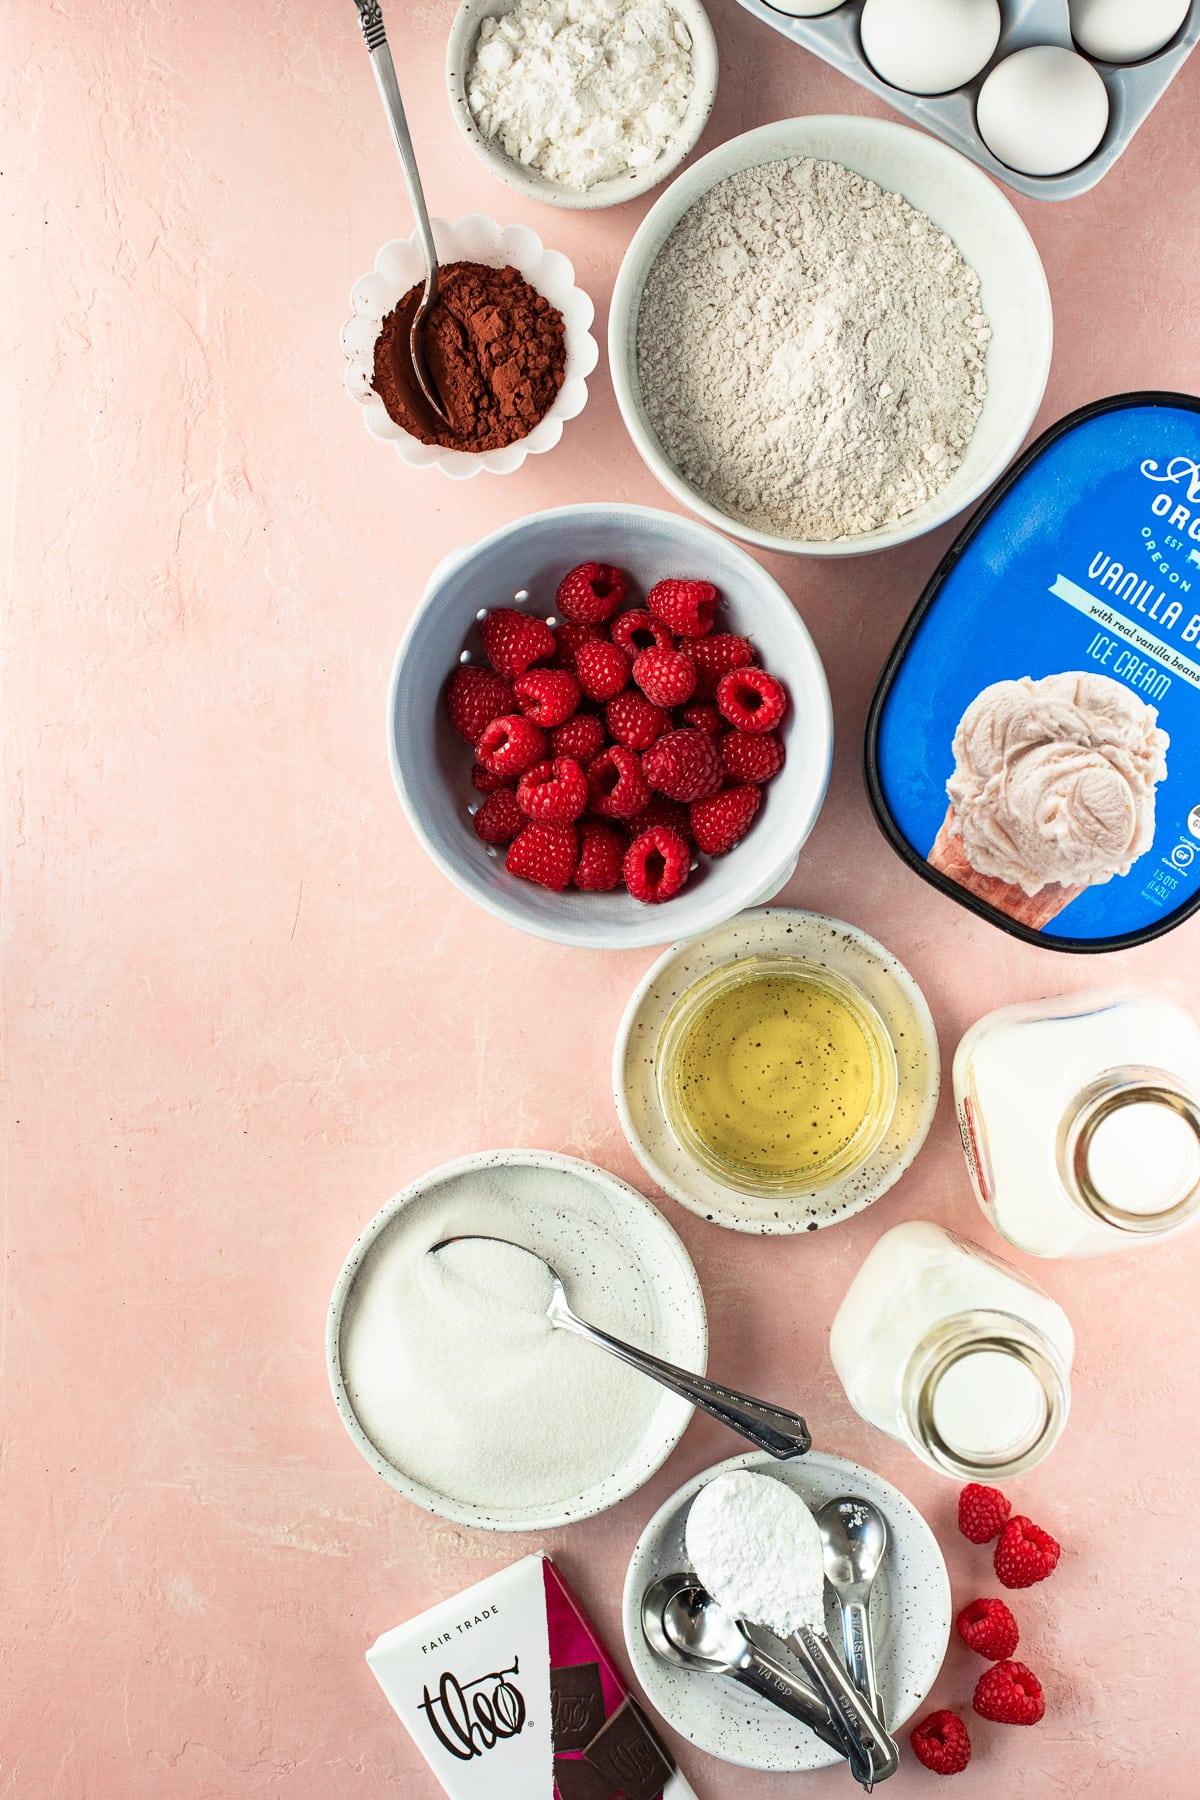 Overhead shot of recipe ingredients including cocoa powder, eggs, flour, cornstarch, raspberries, ice cream, oil, buttermilk, heavy cream, granulated sugar, dark chocolate, and powdered sugar.